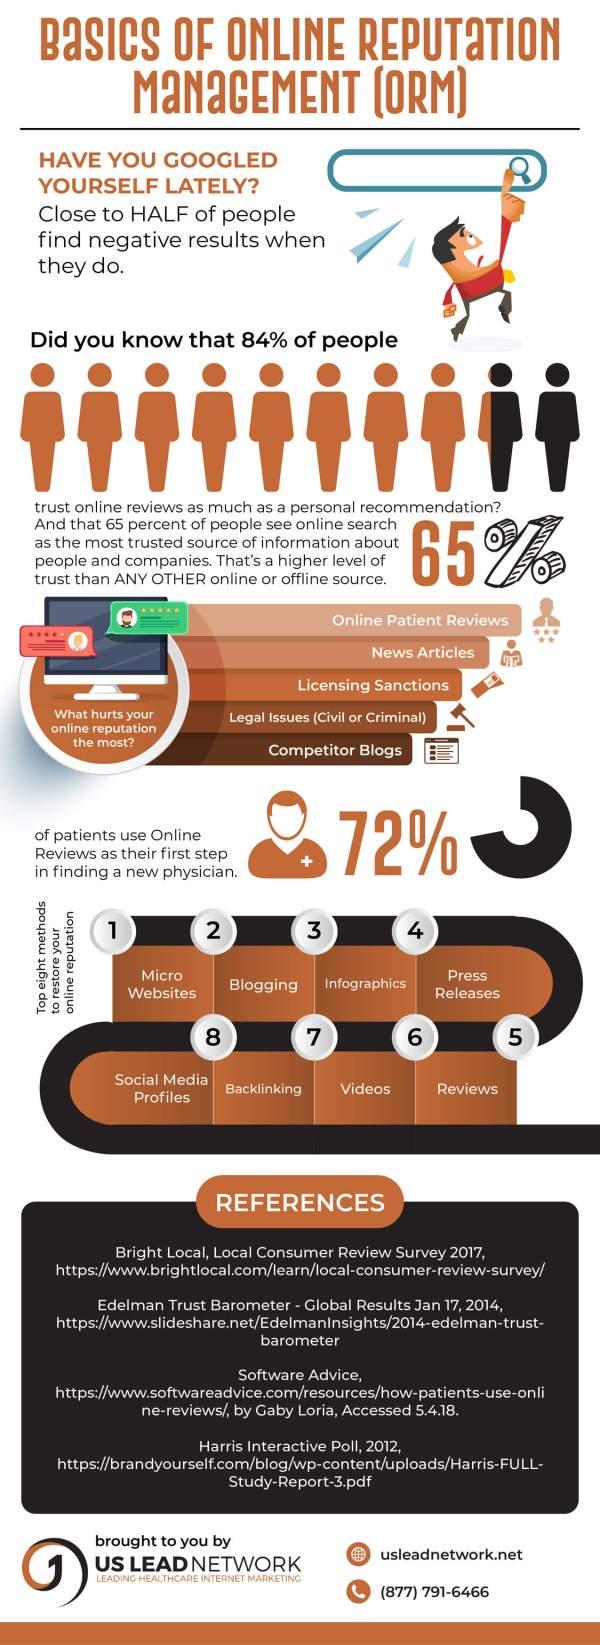 ORM-Infographic